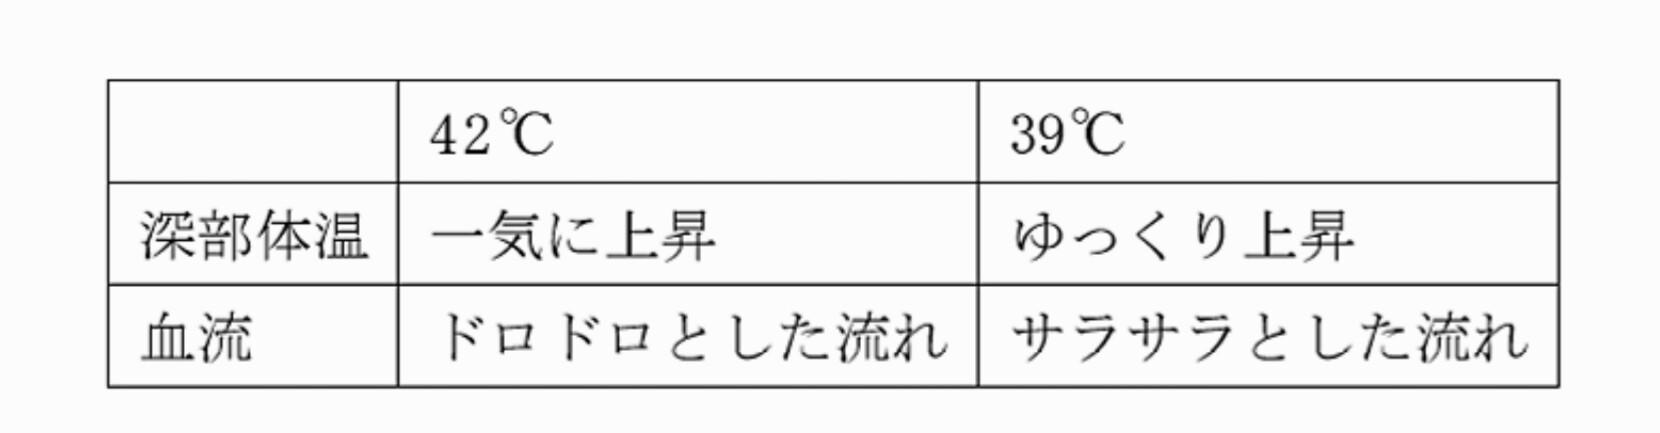 _20171205_200316